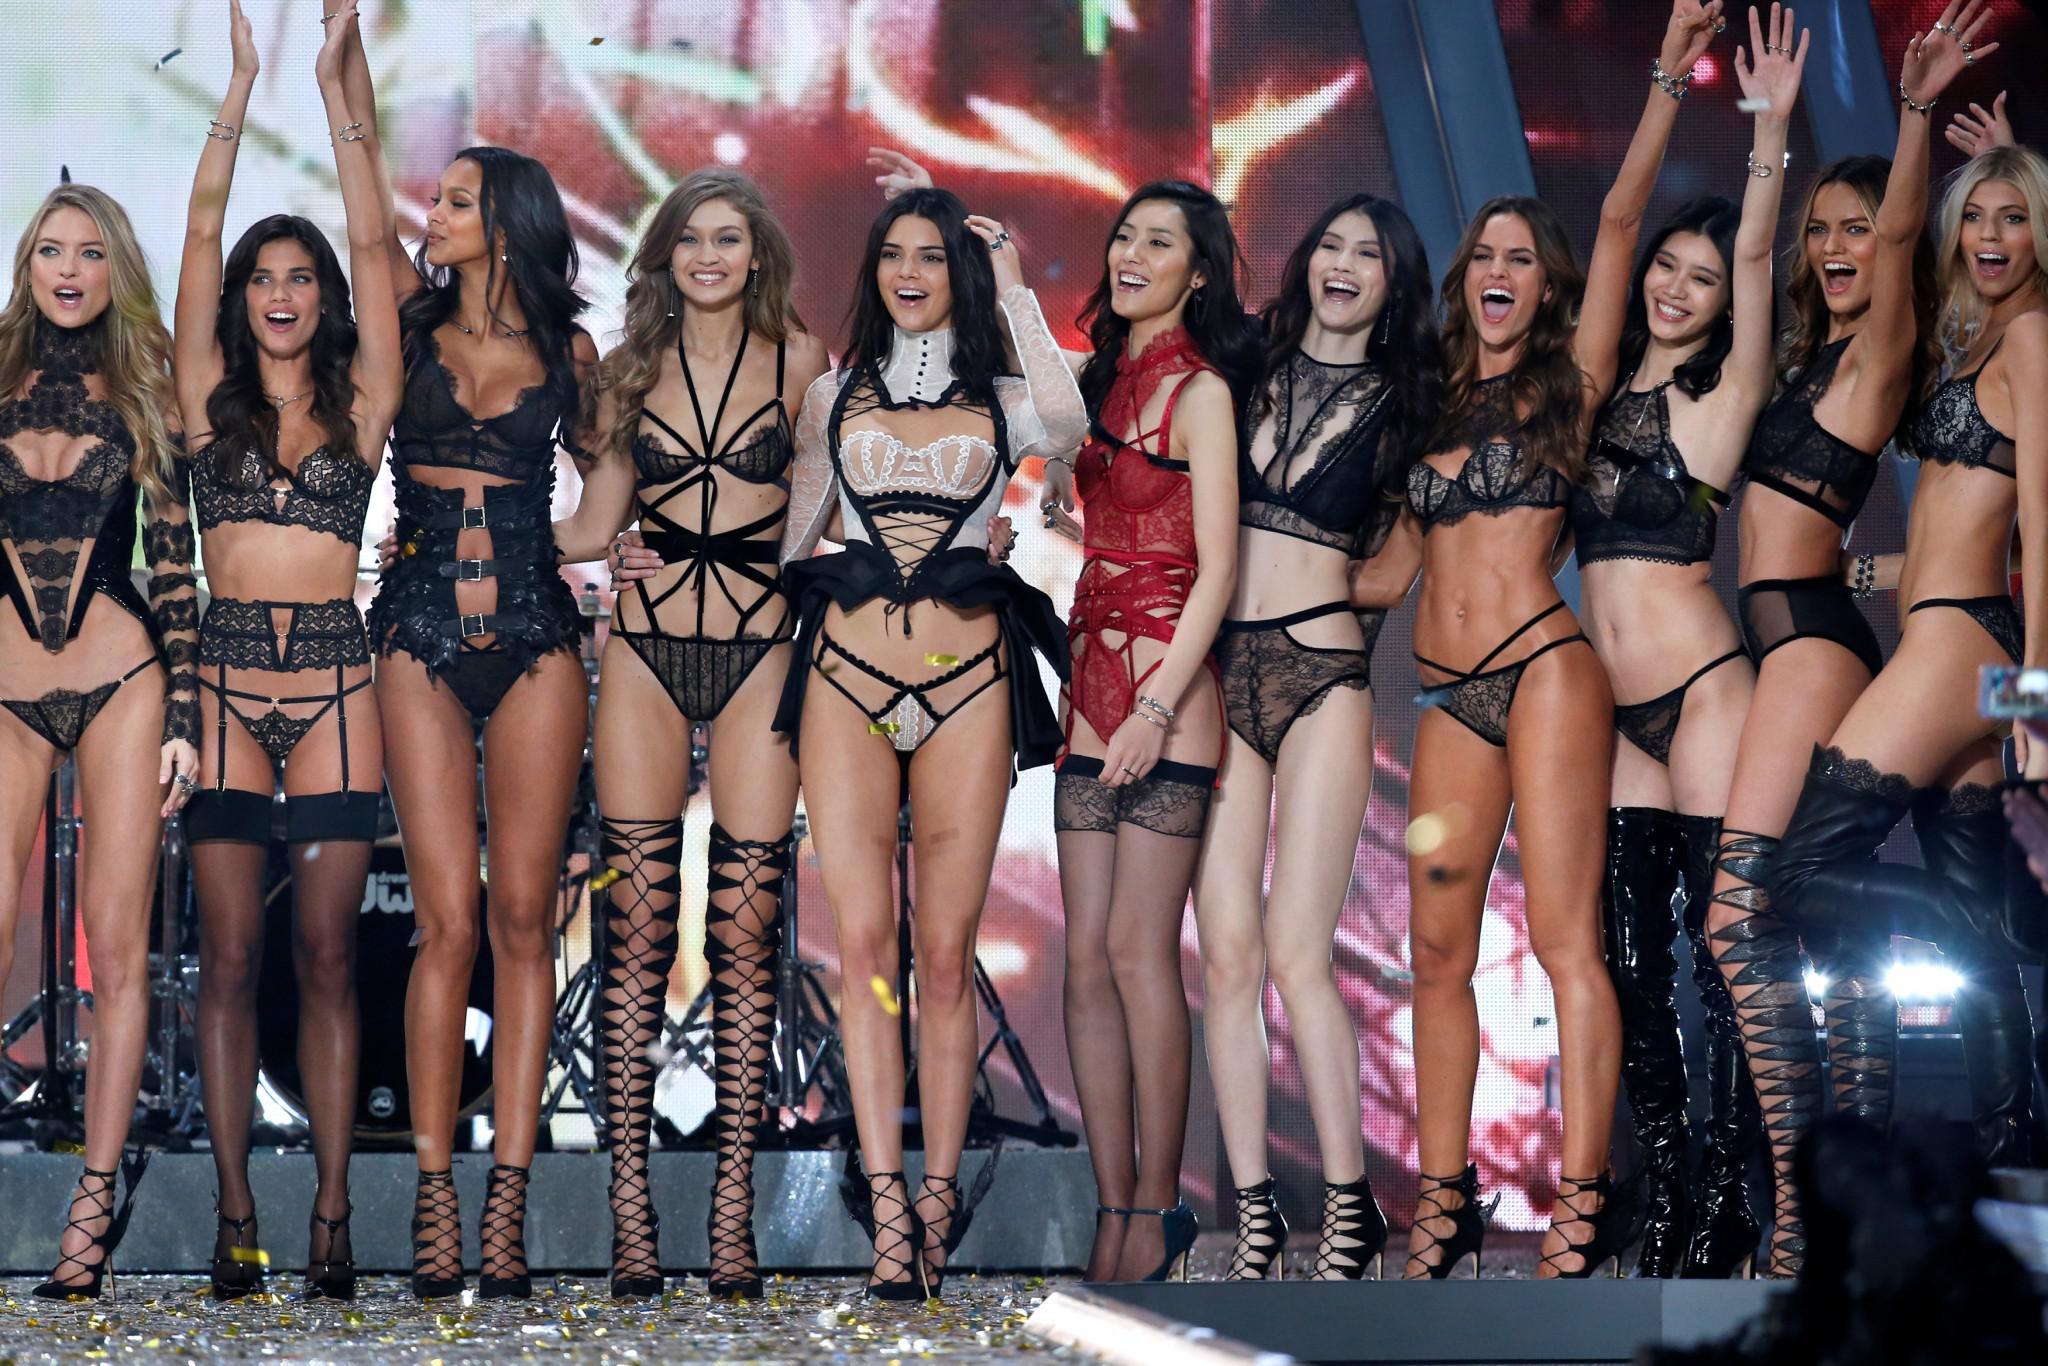 Victoria-Secret-show-esorouxa-modela-1300-14 Το show της Victoria's Secret που «κόλασε» το Παρίσι με τα αγγελάκια της